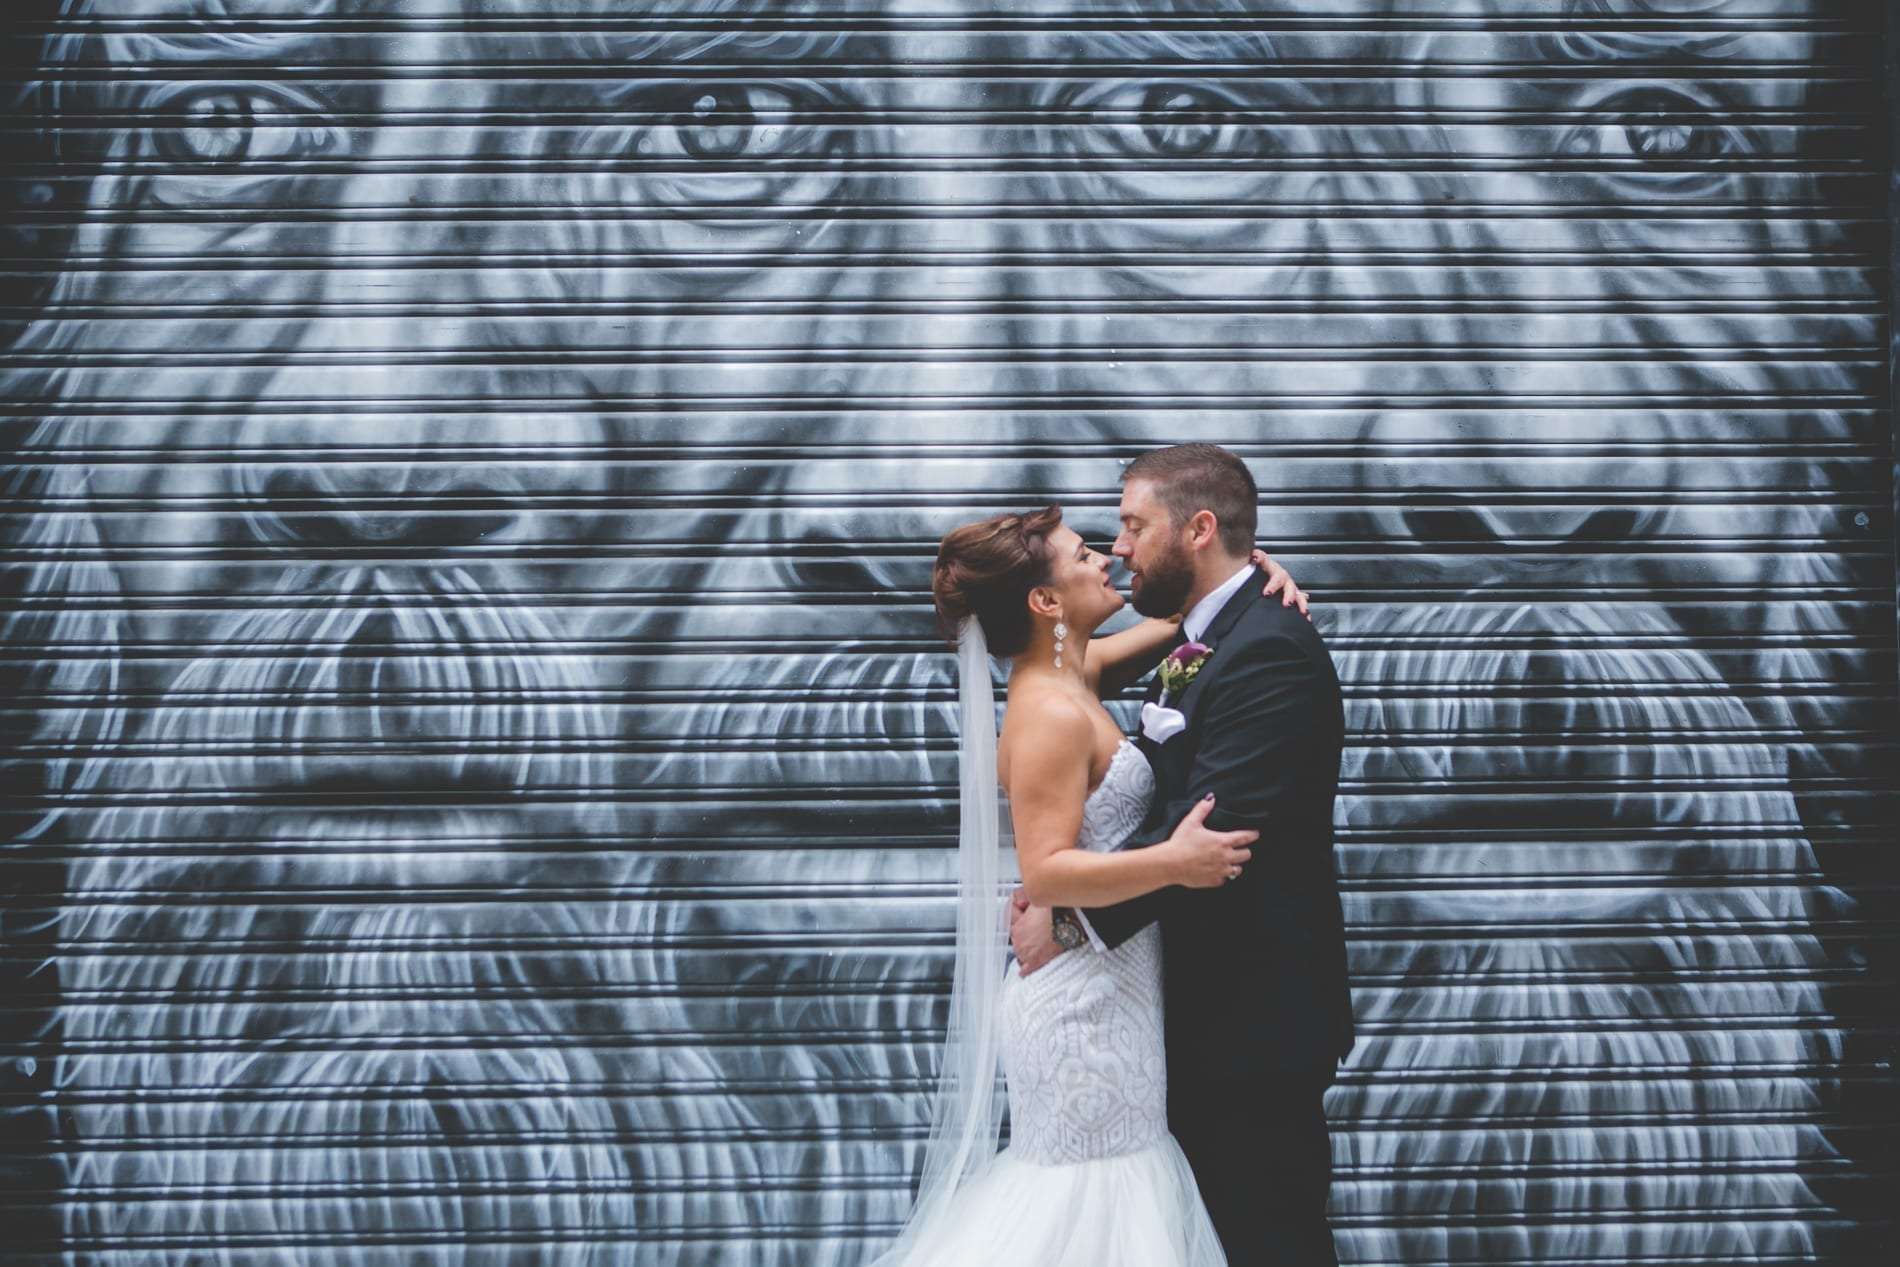 Creative philadelphia wedding photography around fishtown